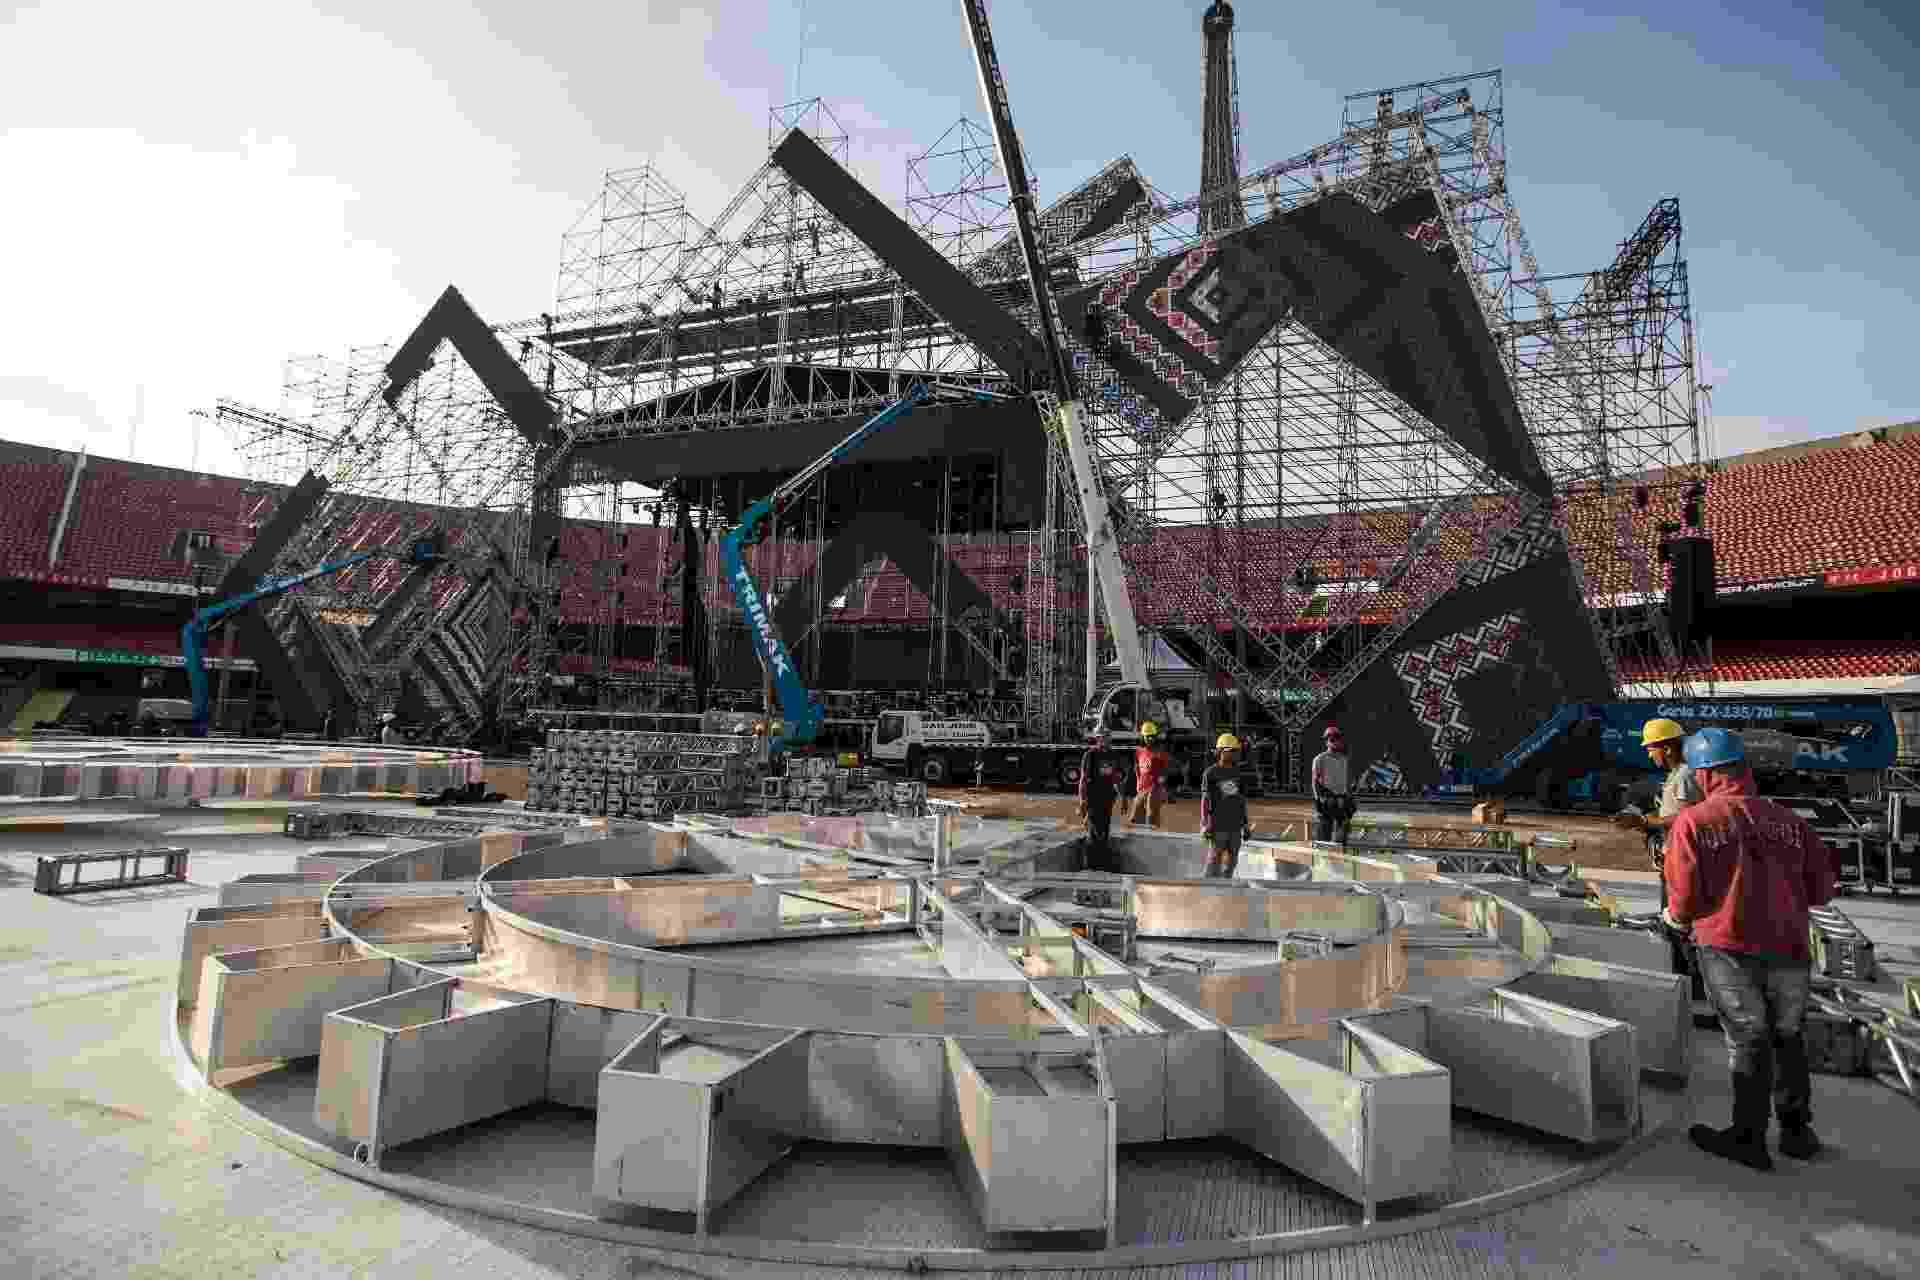 Villa Mix Festival em São Paulo terá palco com 70 metros - Simon Plestenjak/UOL